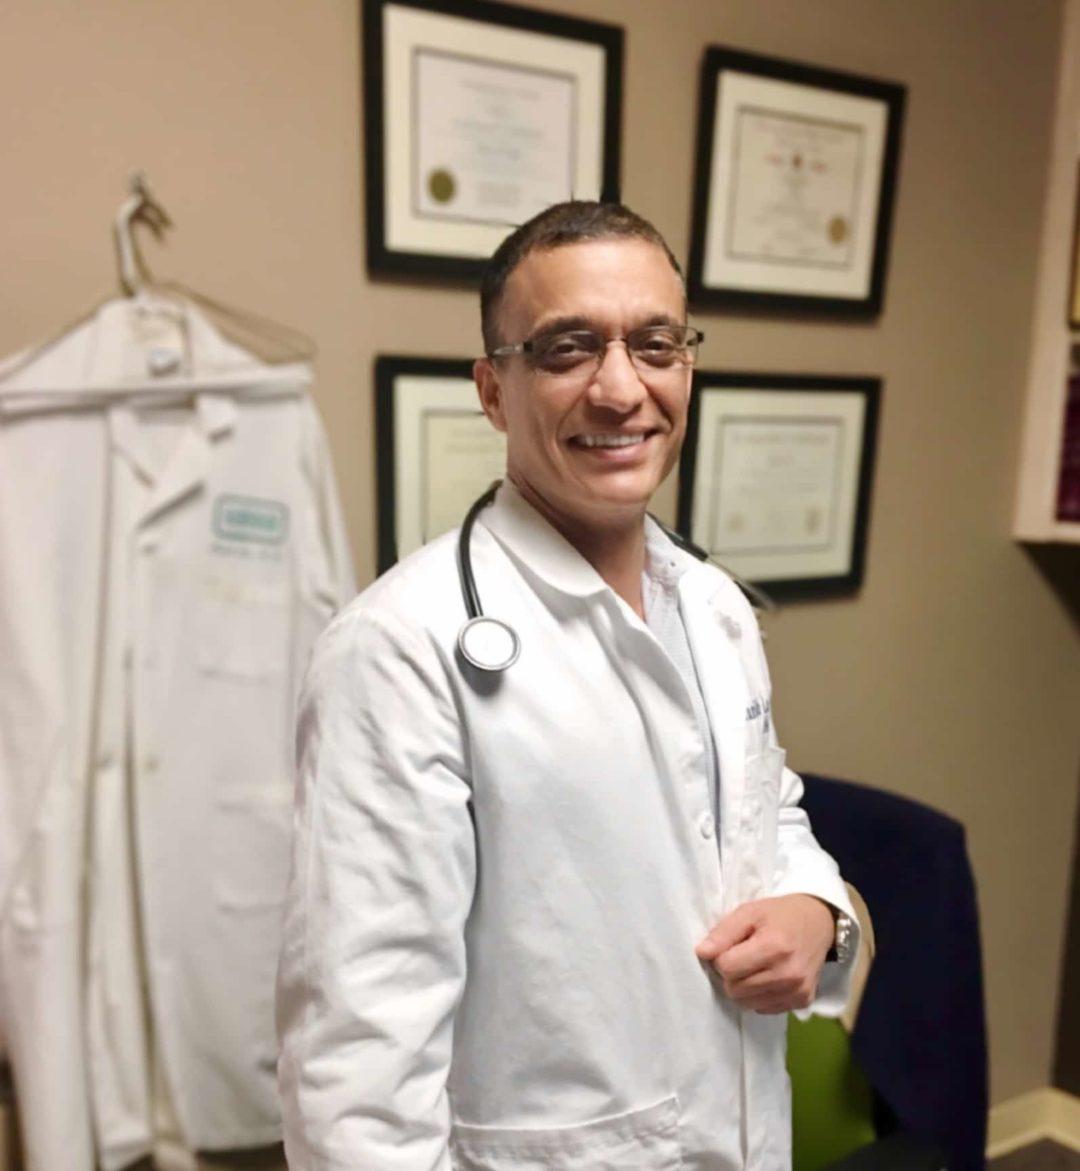 Dr. Munish Lal, Pain Management doctor in Torrance